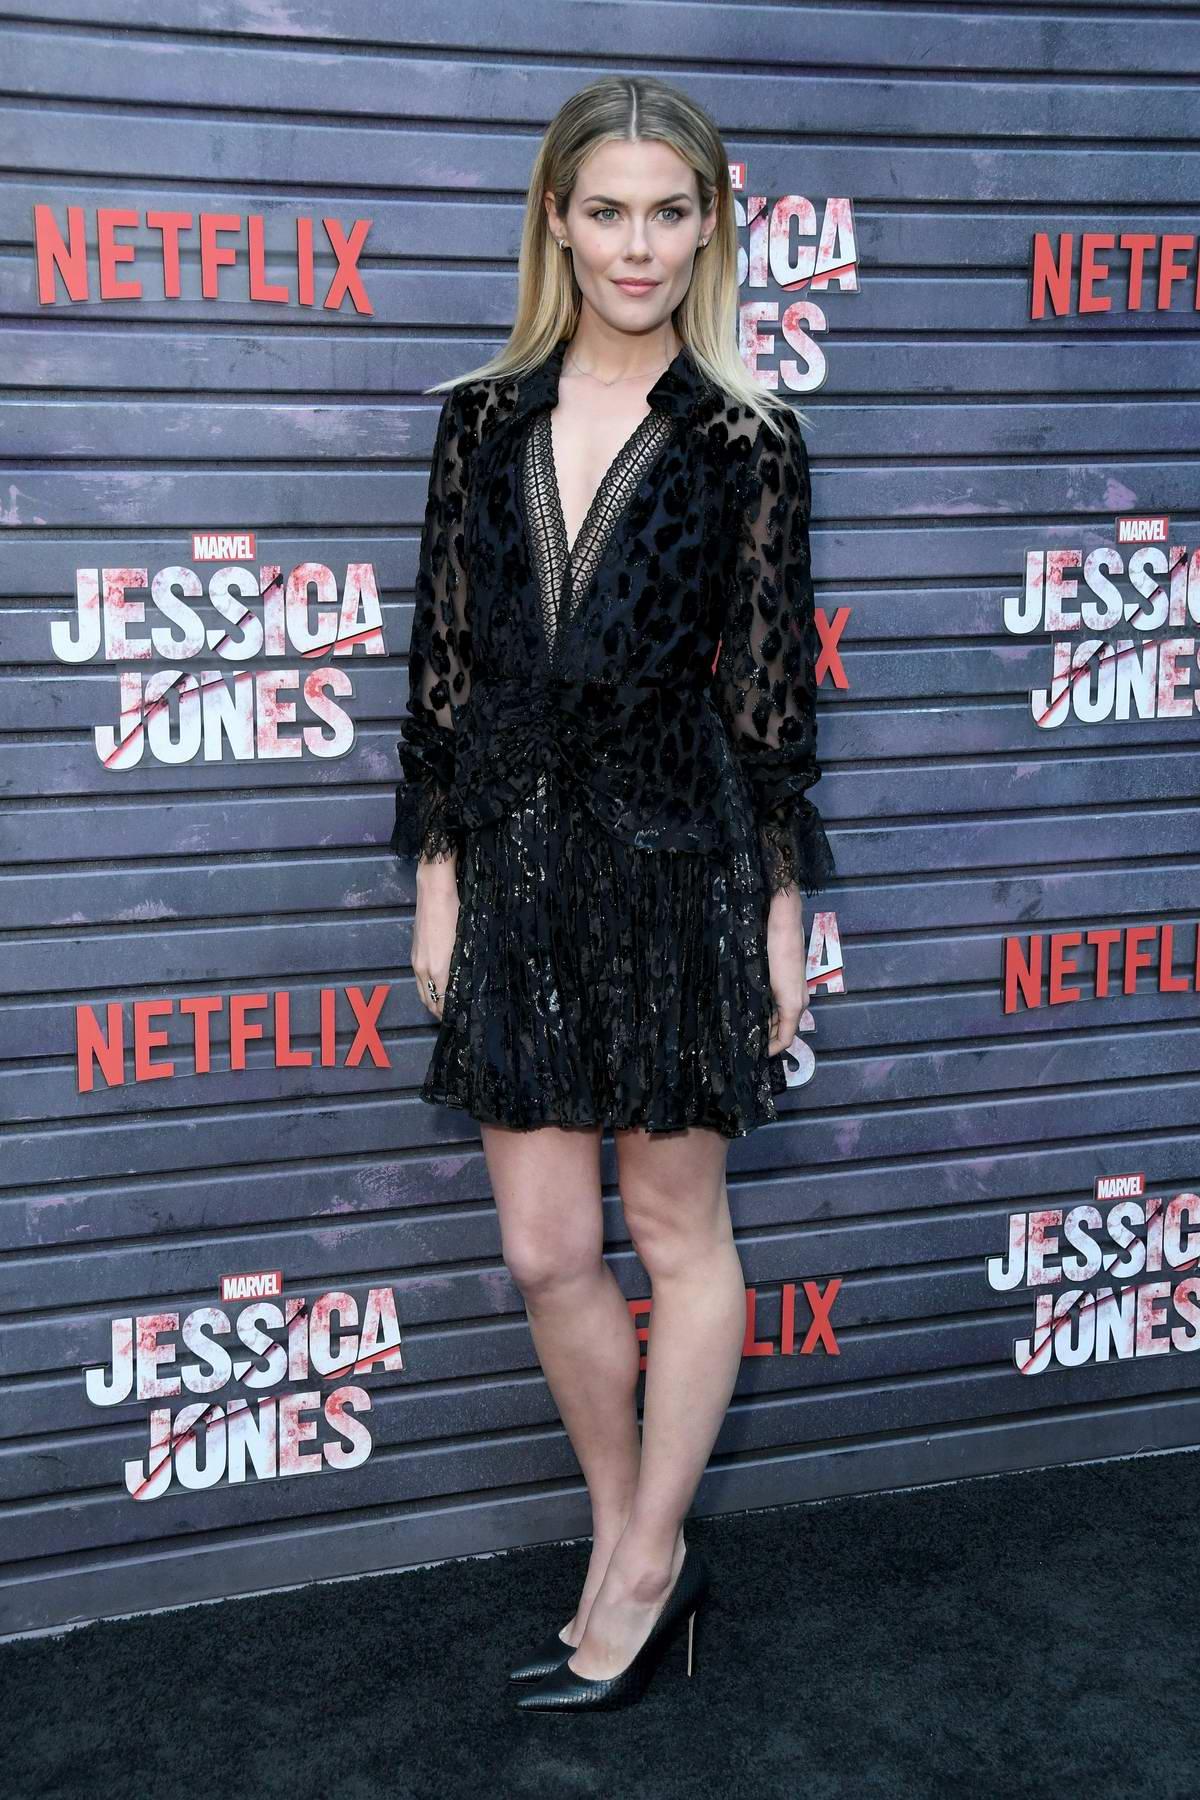 Rachael Taylor attends the Special Screening of Netflix's 'Jessica Jones' Season 3 held at Arclight Hollywood, California